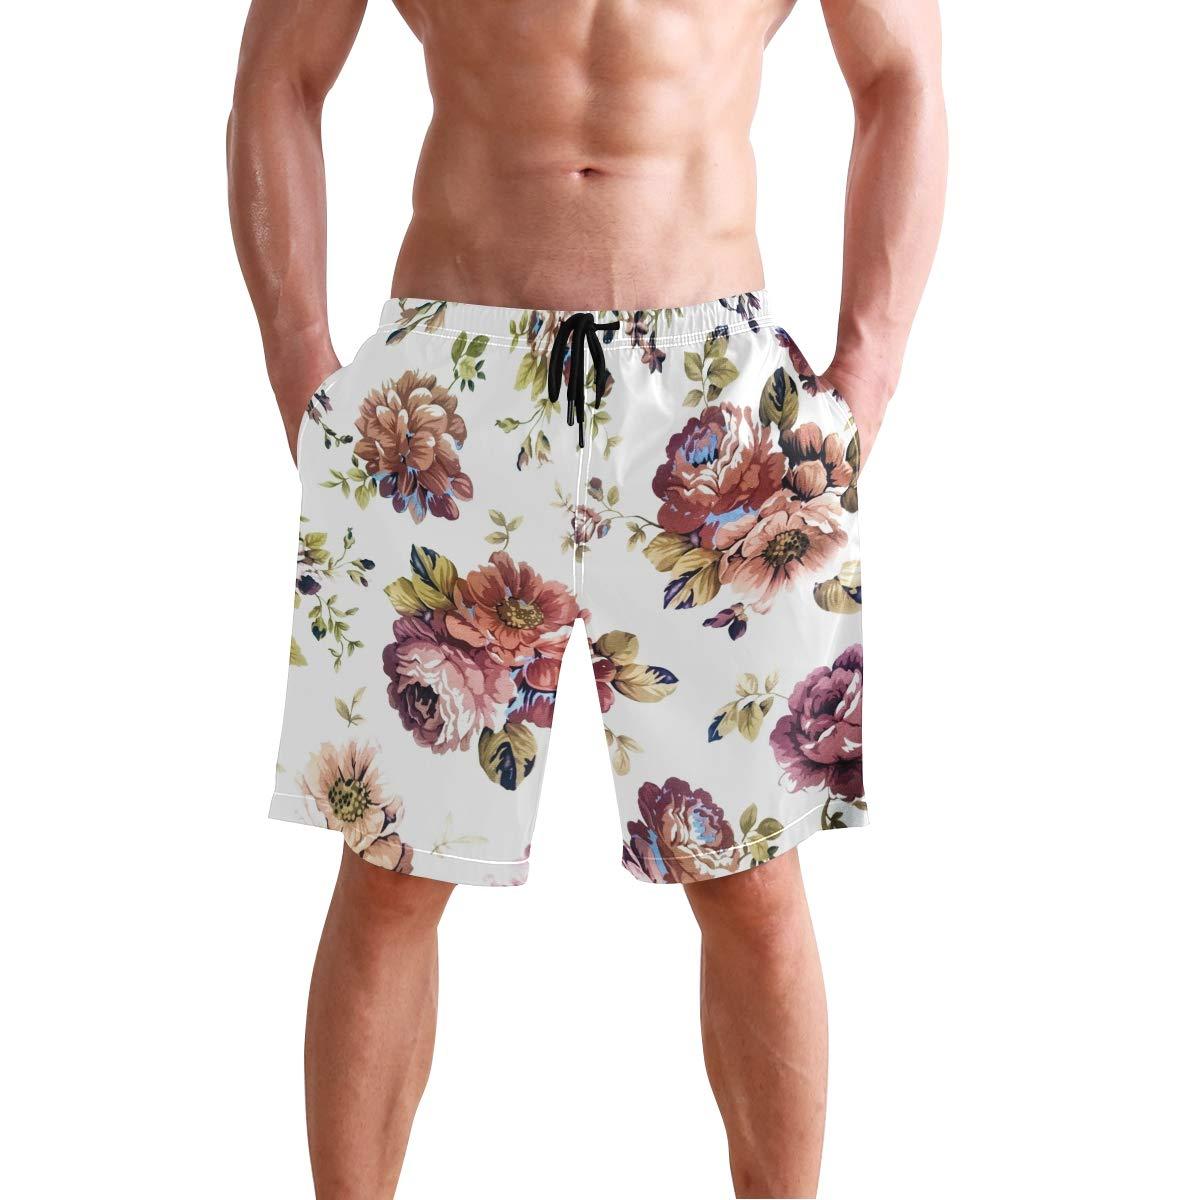 DEYYA Peony Flower Summer Beach Shorts Pants Mens Swim Trunks Board Short for Men